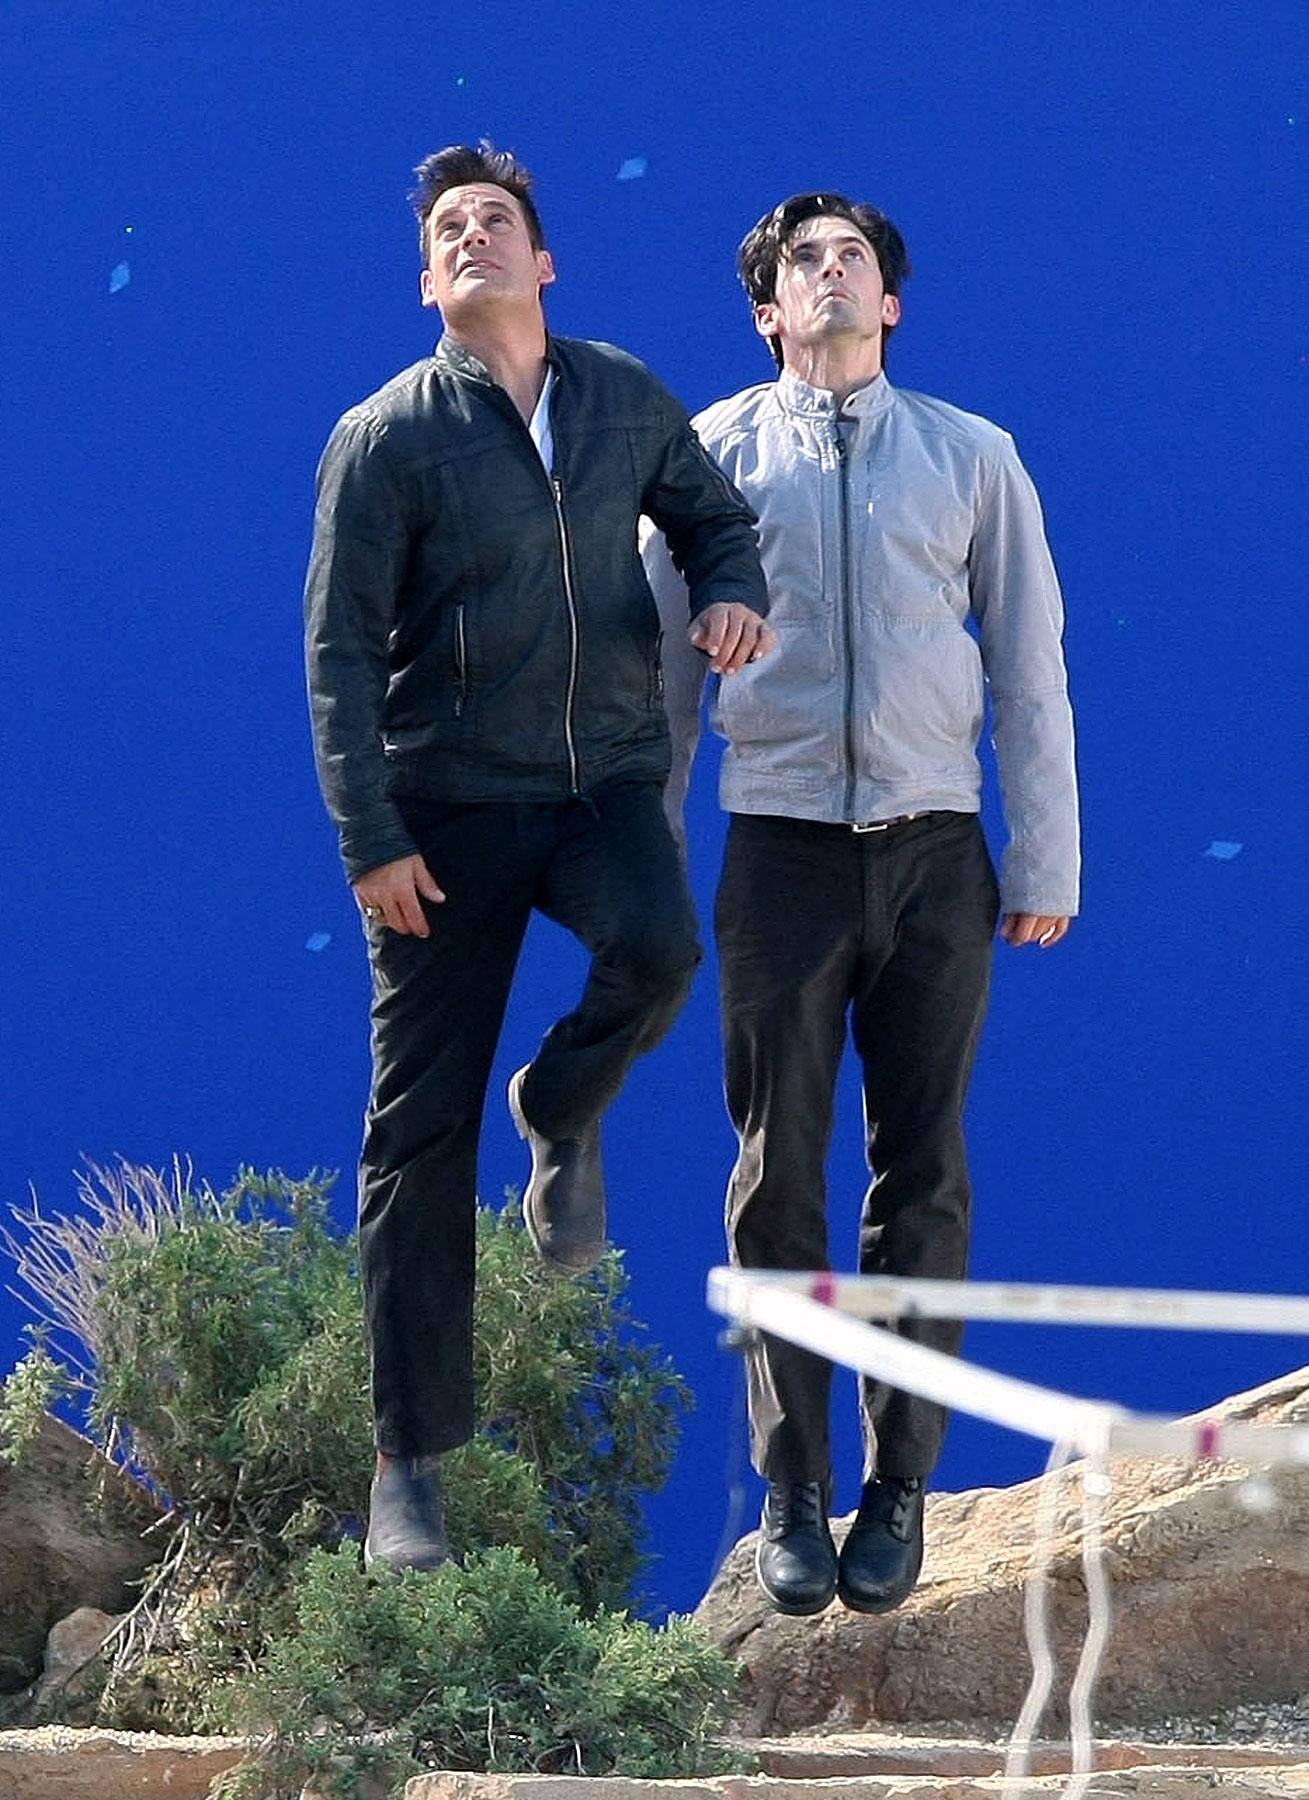 PHOTO GALLERY: Milo & Adrian Film Heroes